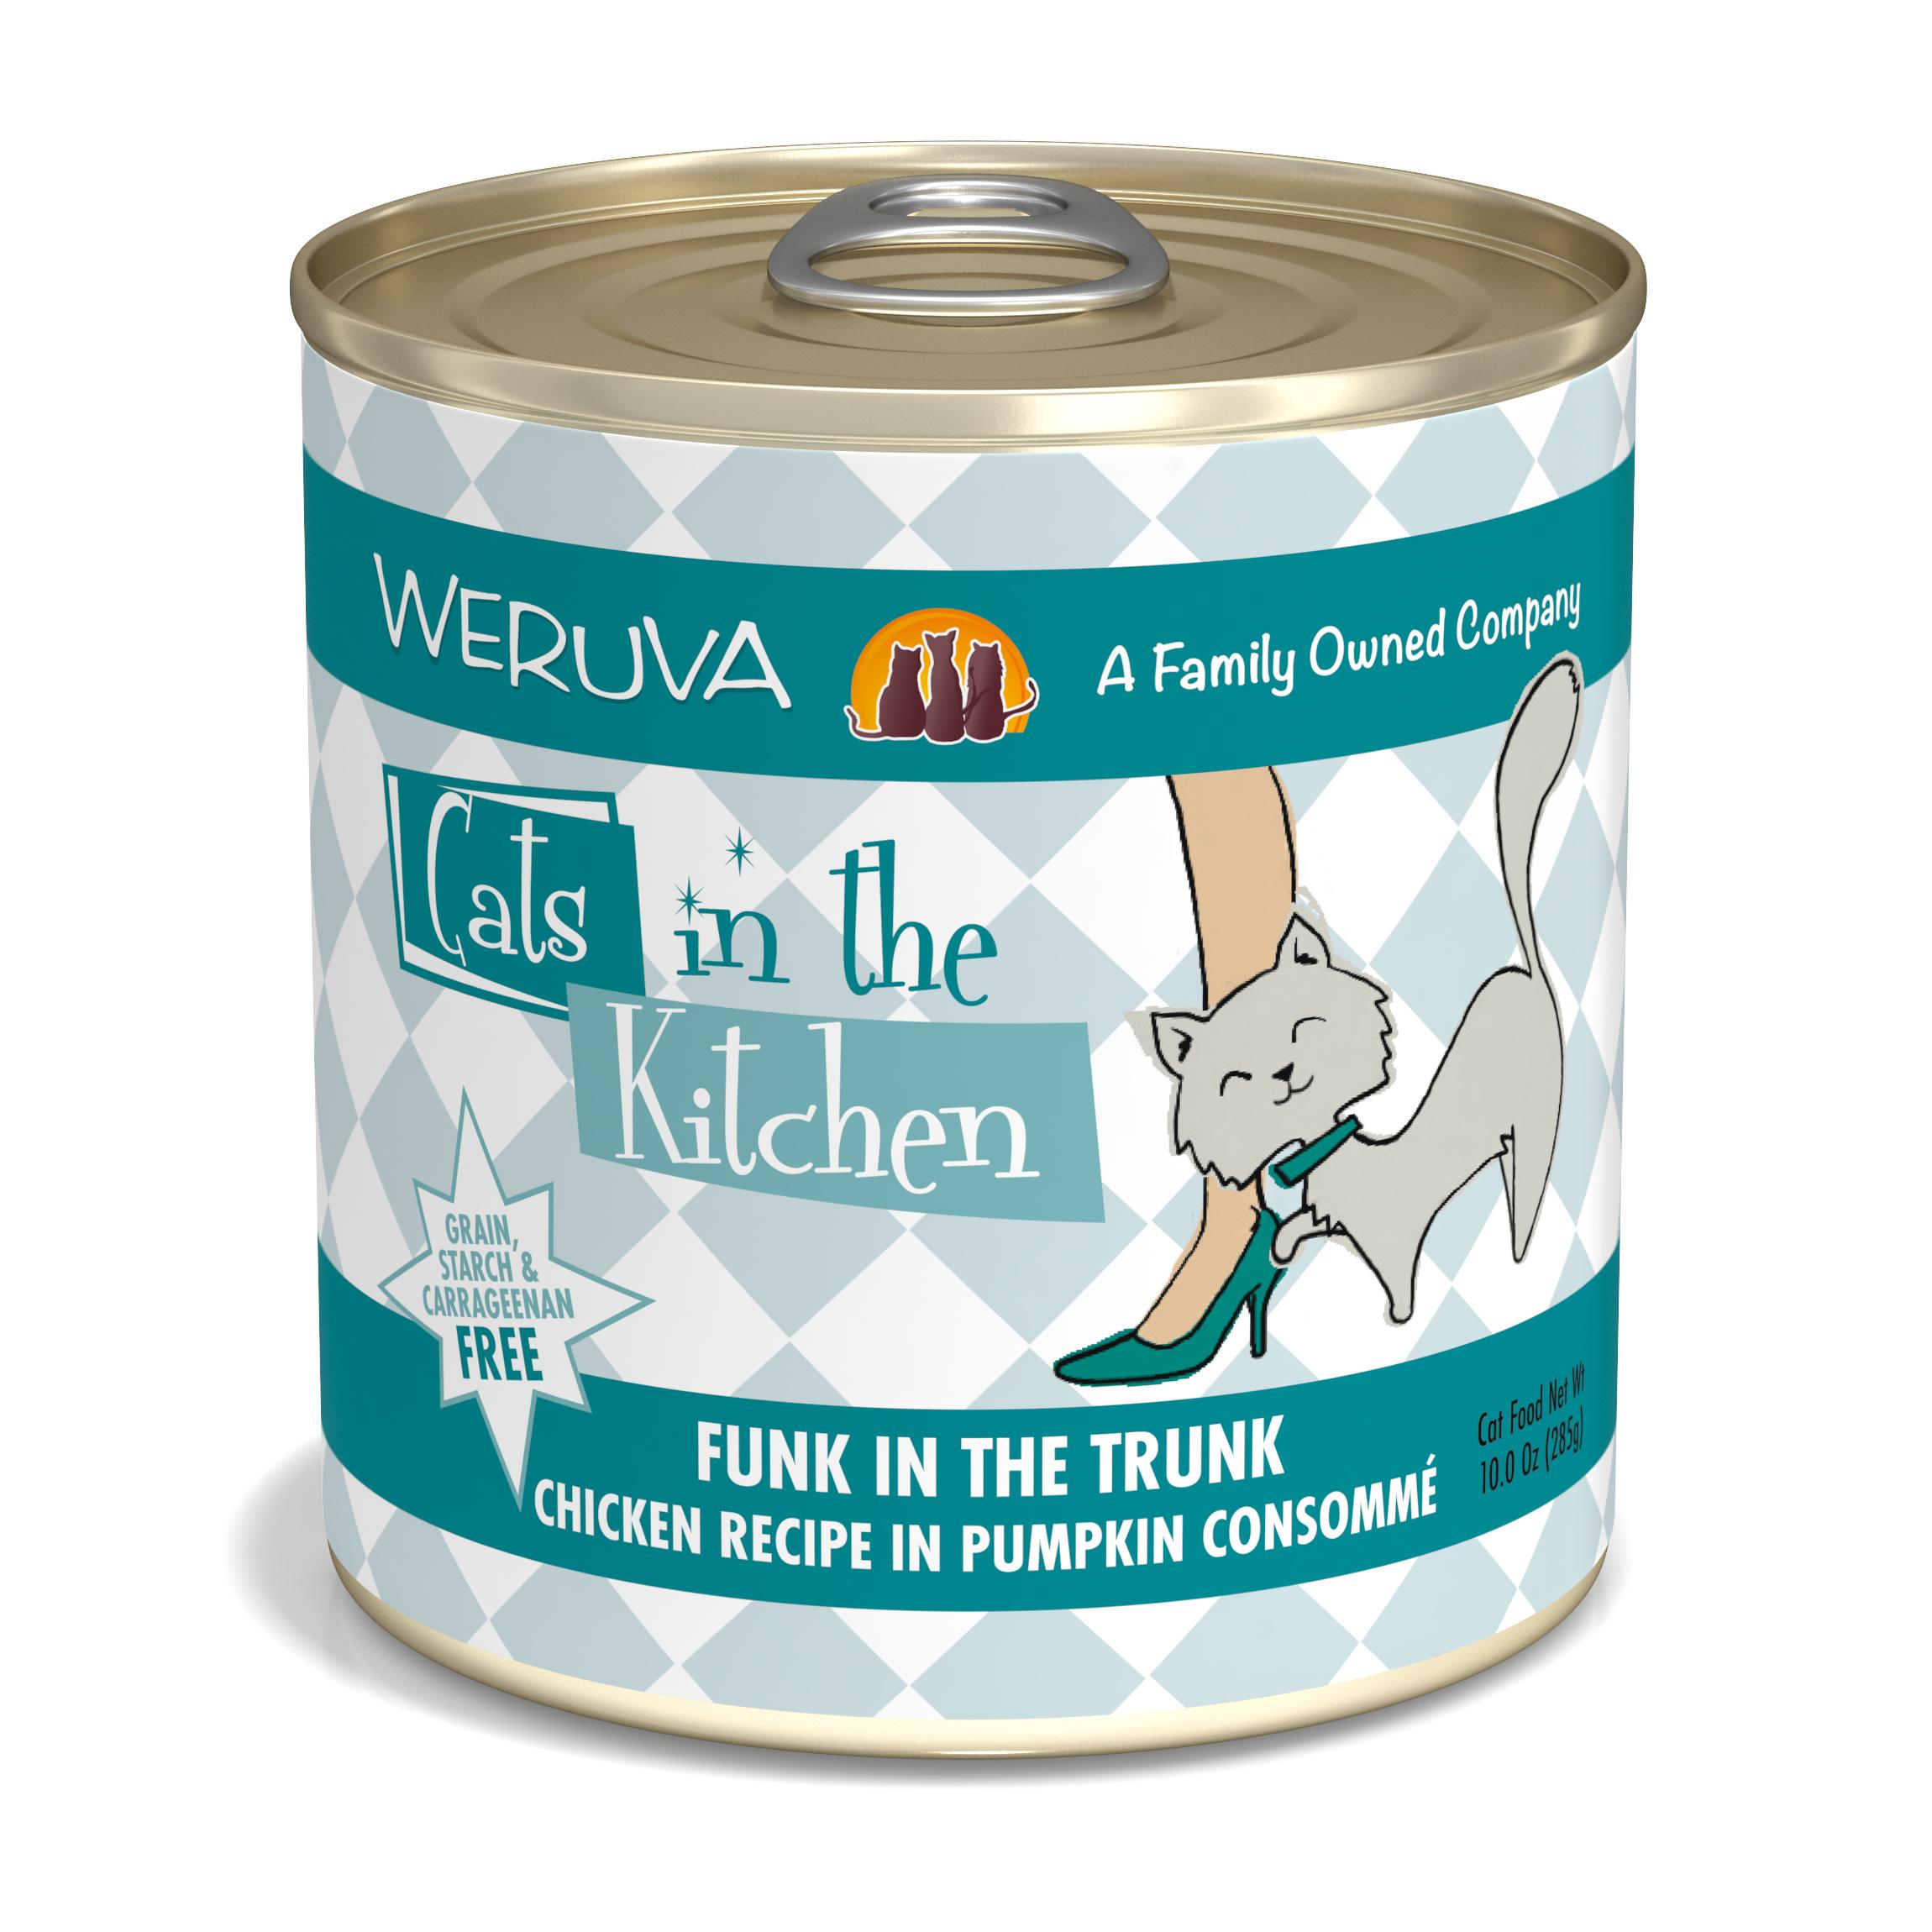 Weruva Cats in the Kitchen Funk In The Trunk Chicken in Pumpkin Consomme Grain-Free Wet Cat Food, 10-oz